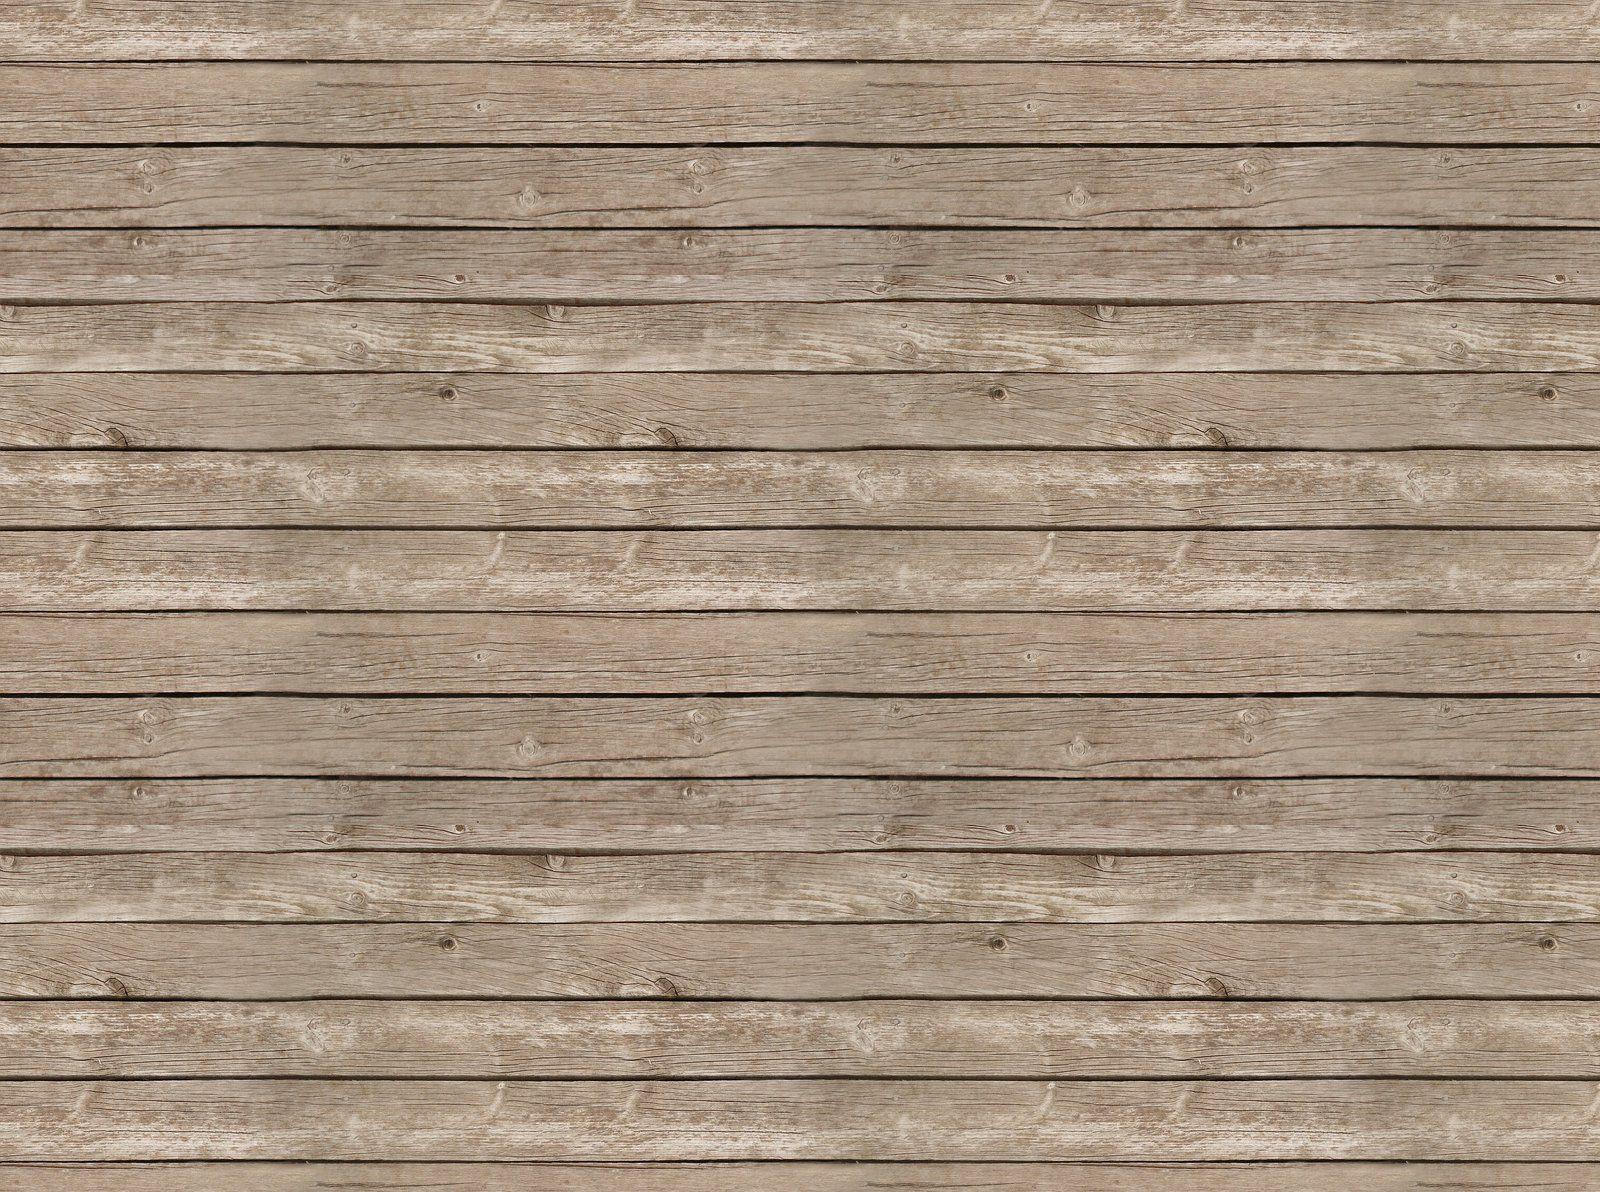 Texture jpg parquet wood deck - Madera Textura Buscar Con Google Texturas Pinterest